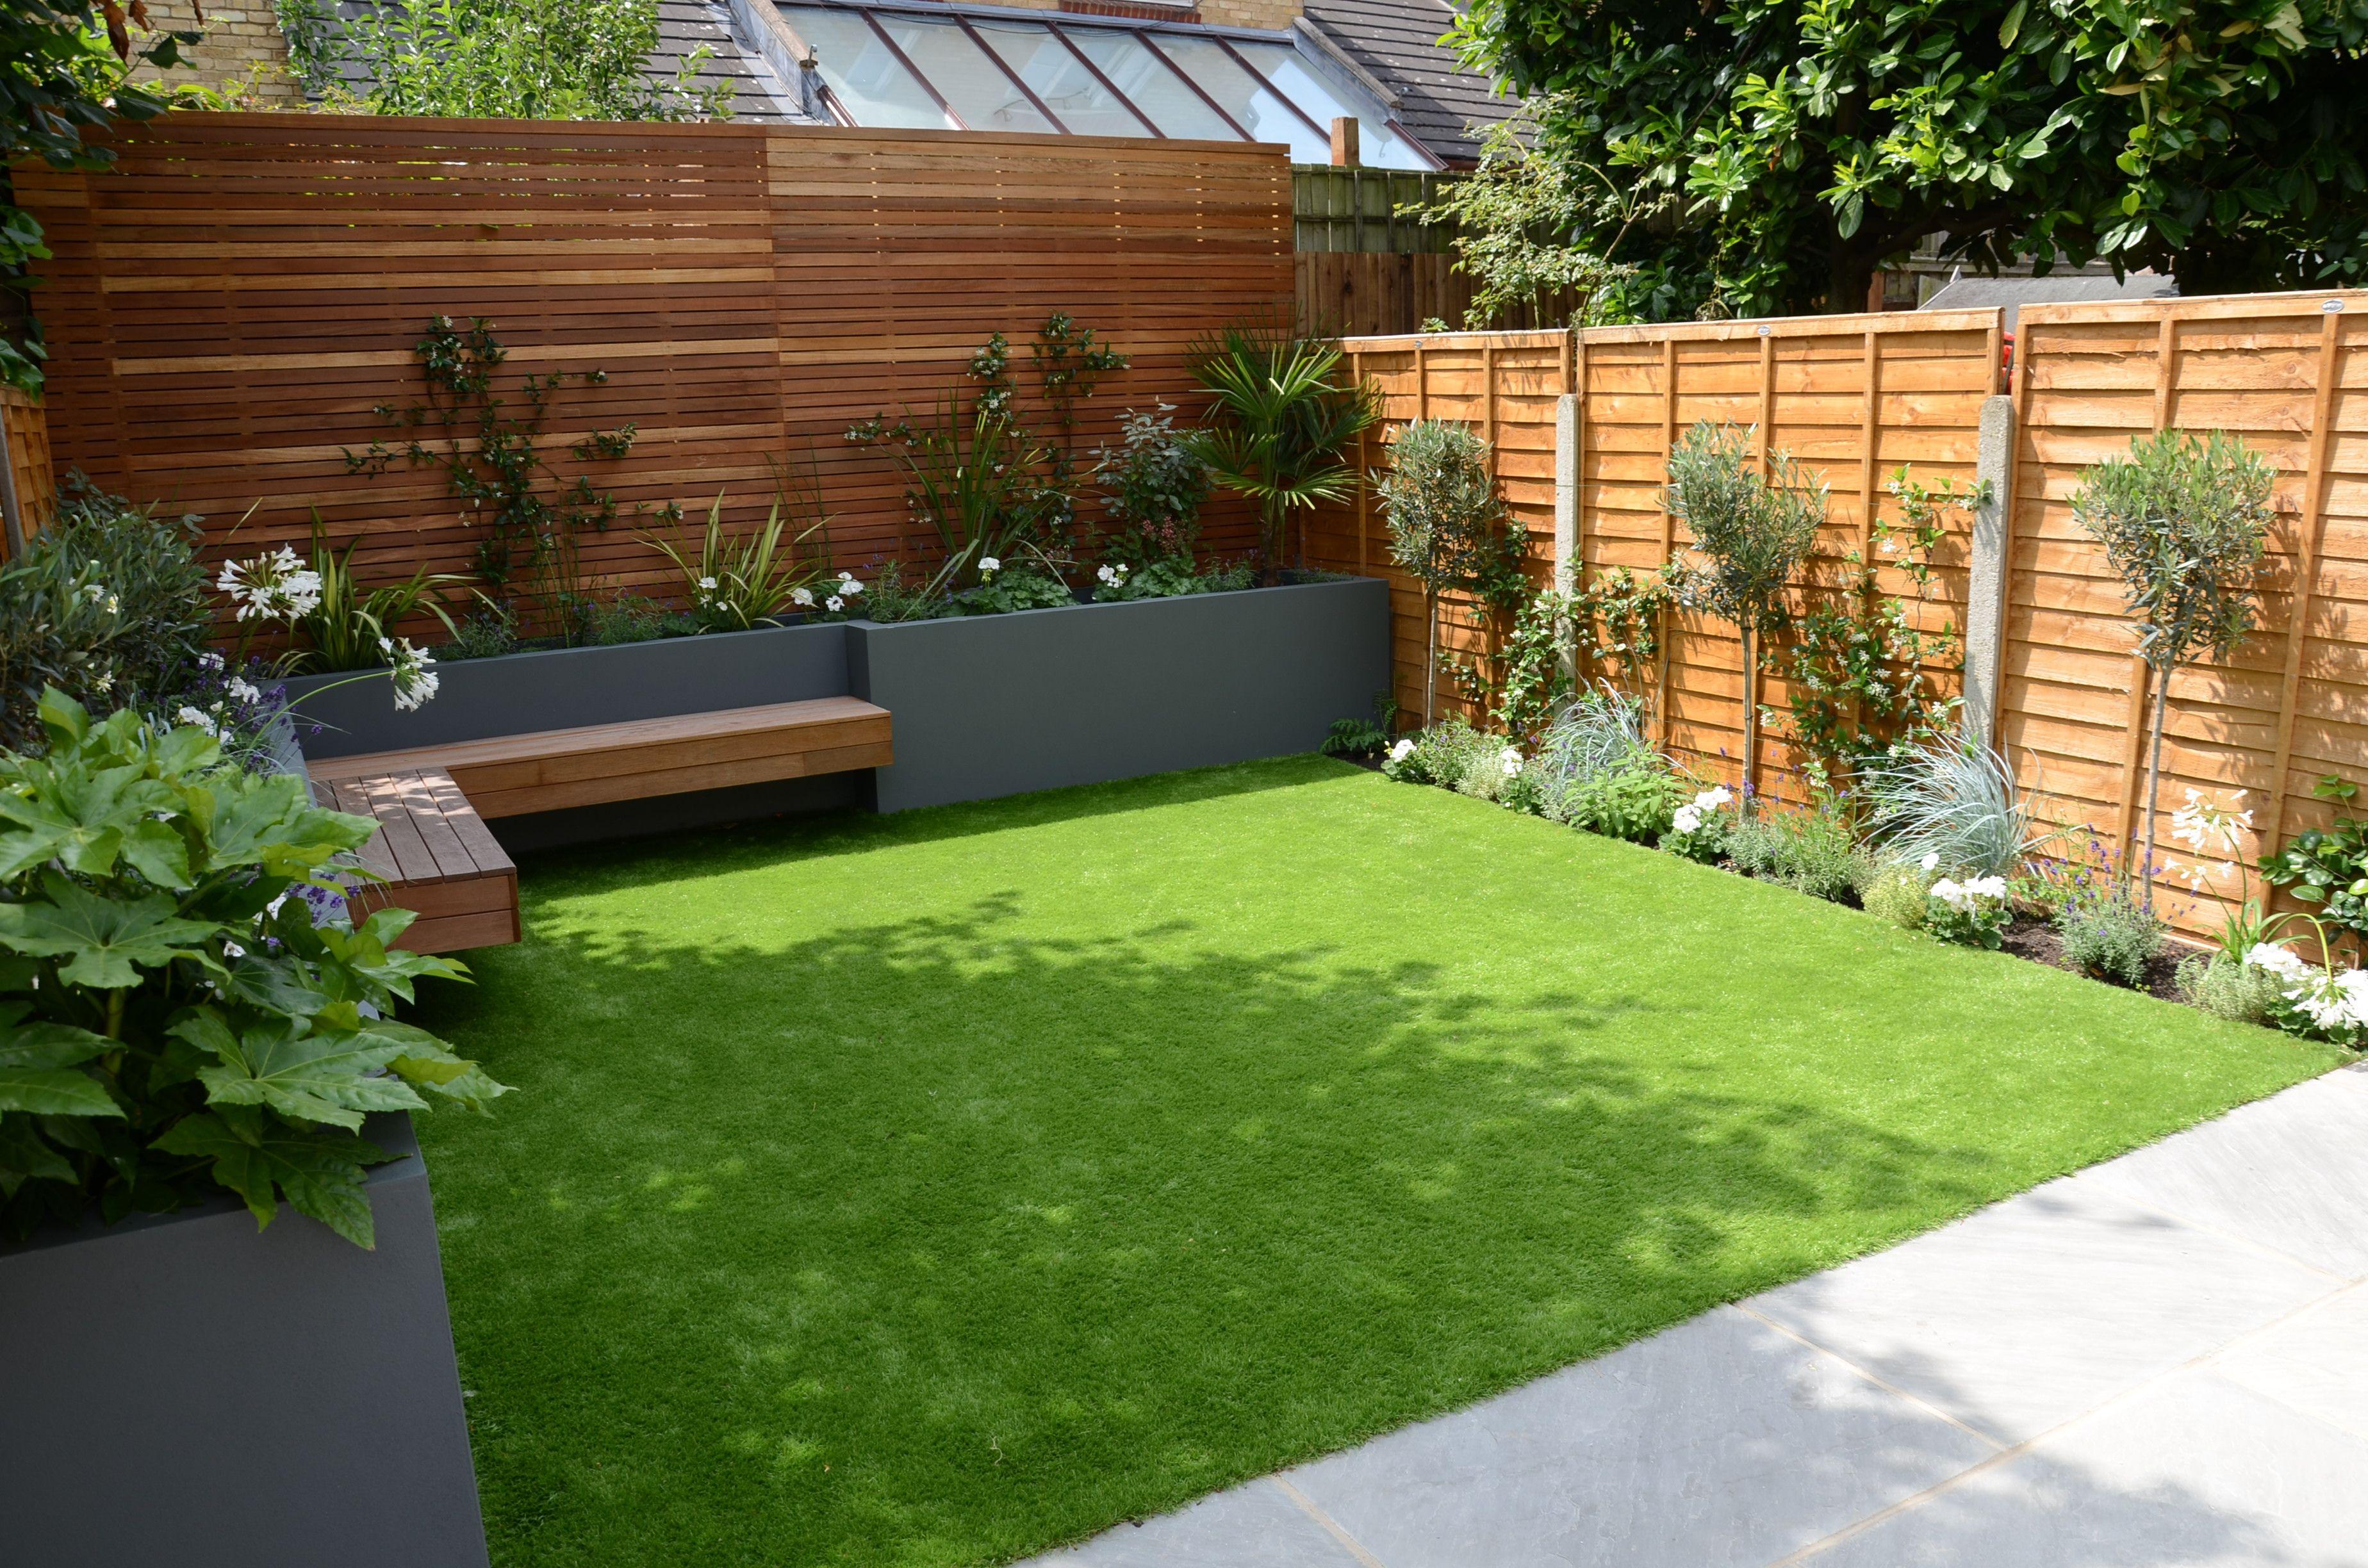 Small garden design tips of new gardeners Decorifusta in